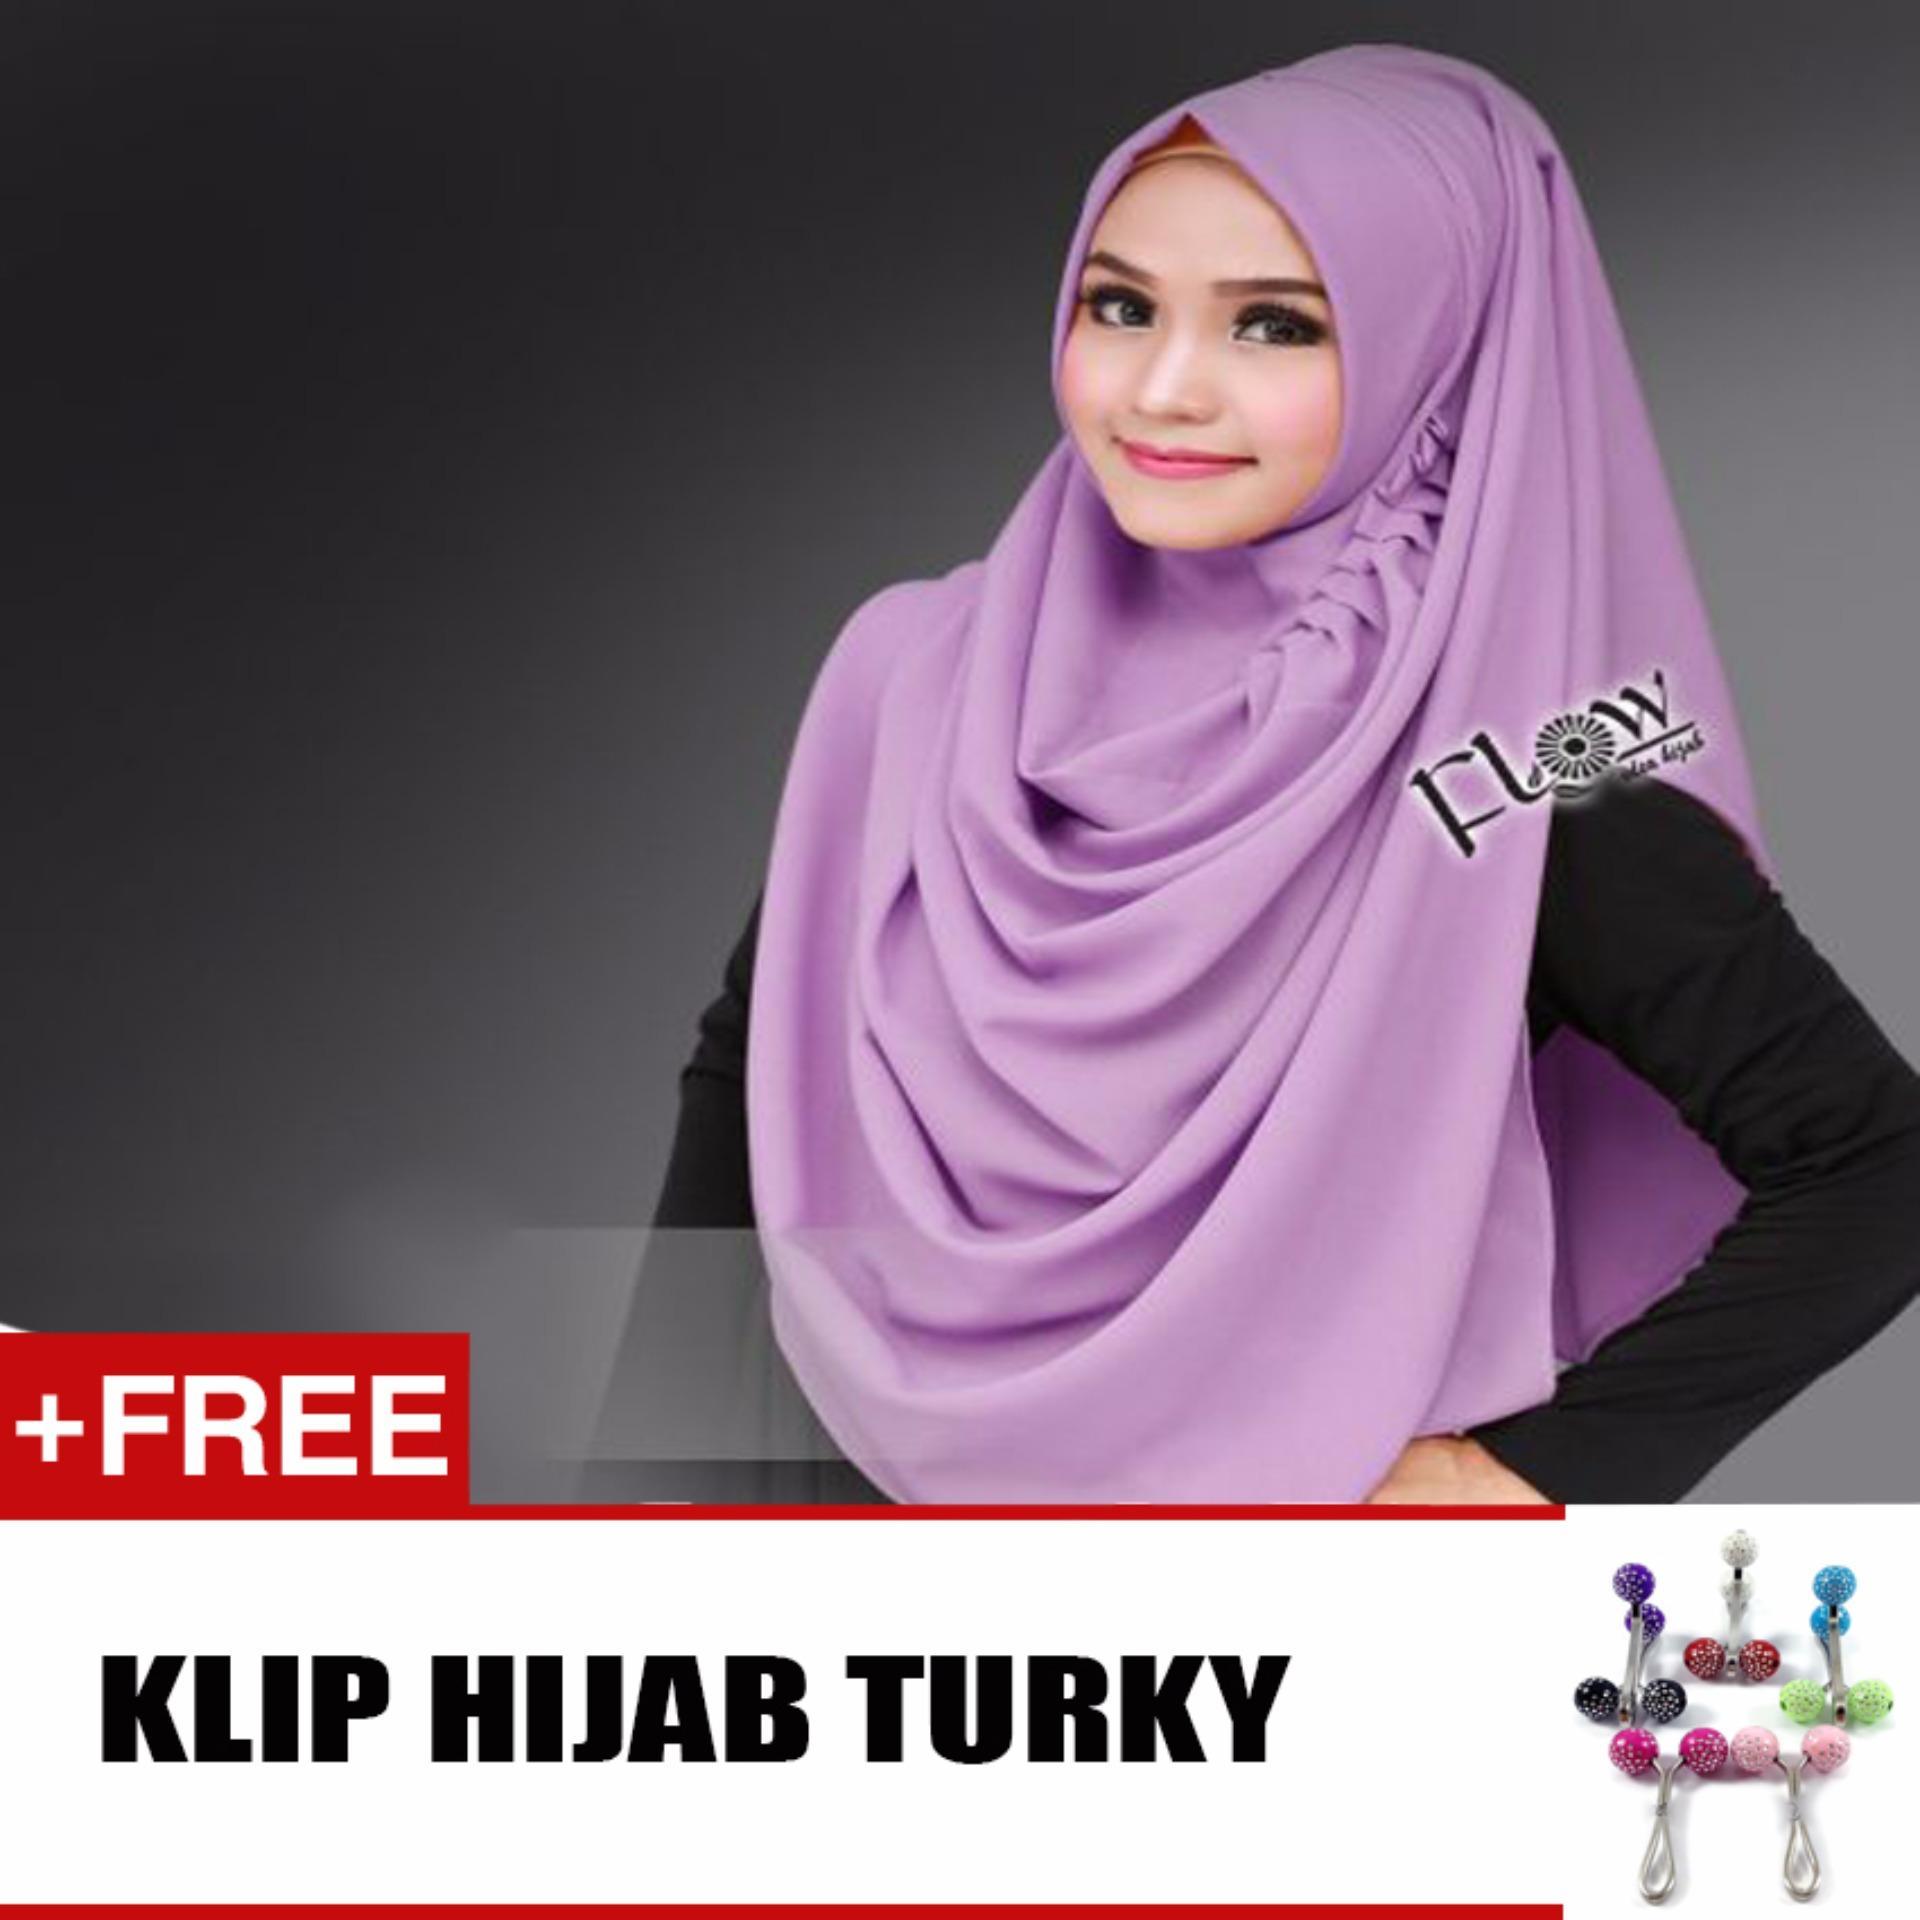 Hijab Jilbab Instant Lcb Maroon Free Klip Daftar Update Harga Khimar Maroko Withpet Sj0004 Salem